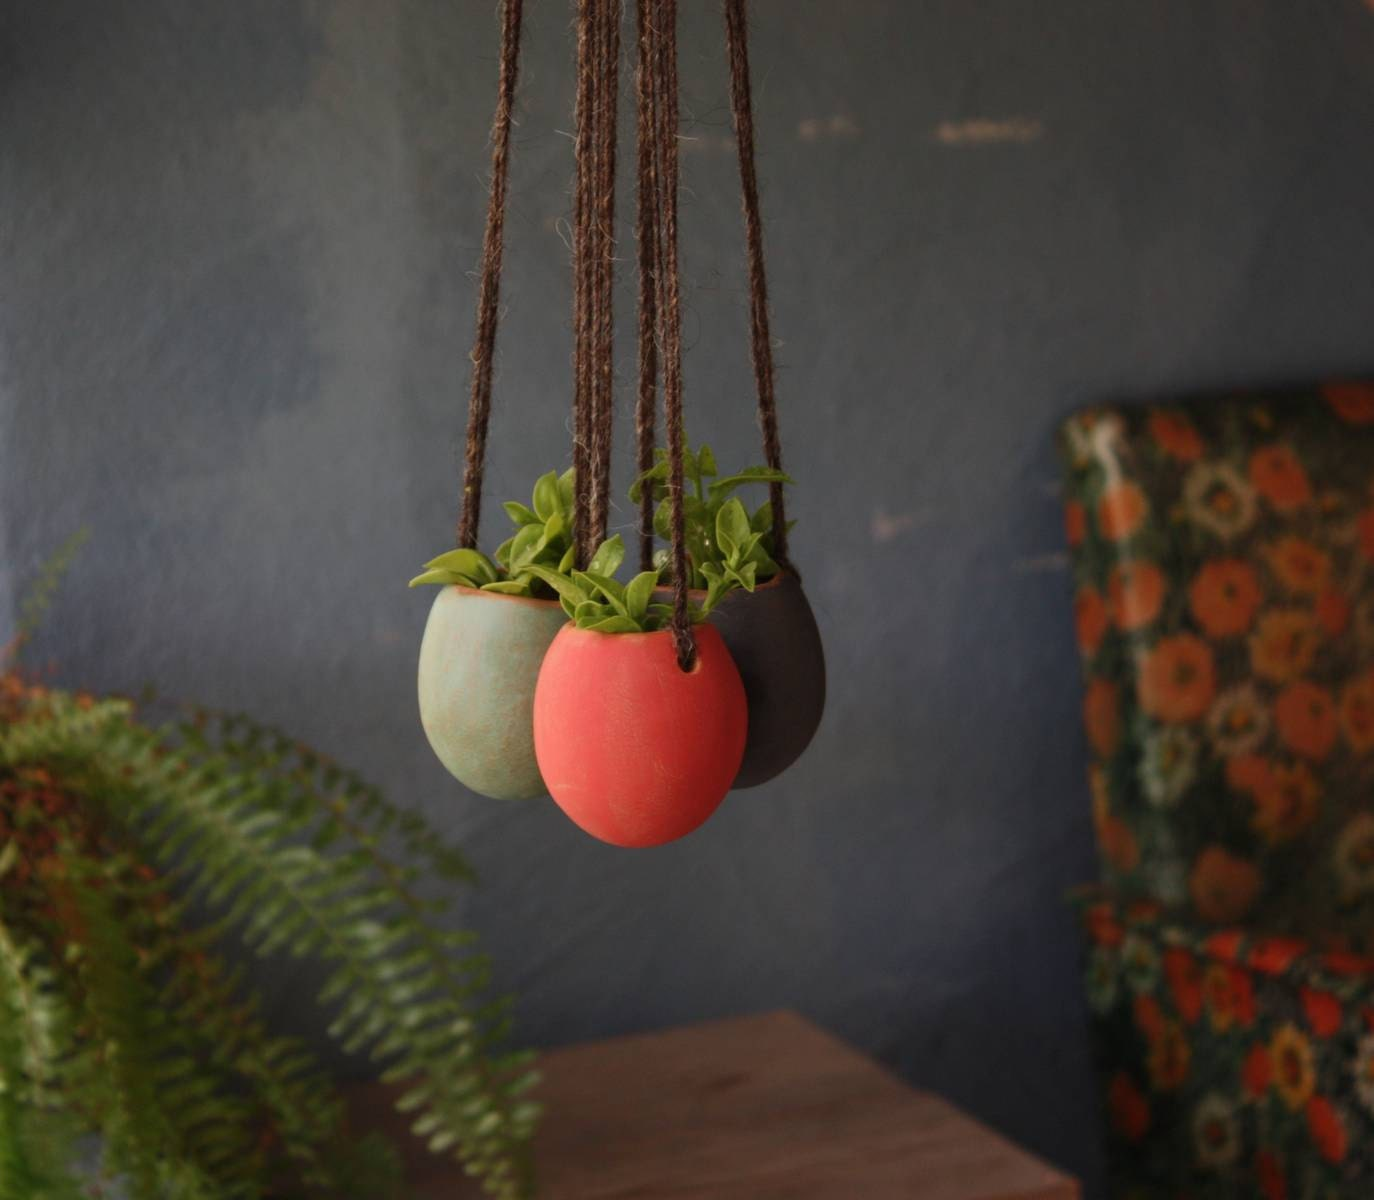 Vasi sospesi in ceramica fatti a mano ideali per piante for Vasi sospesi per piante